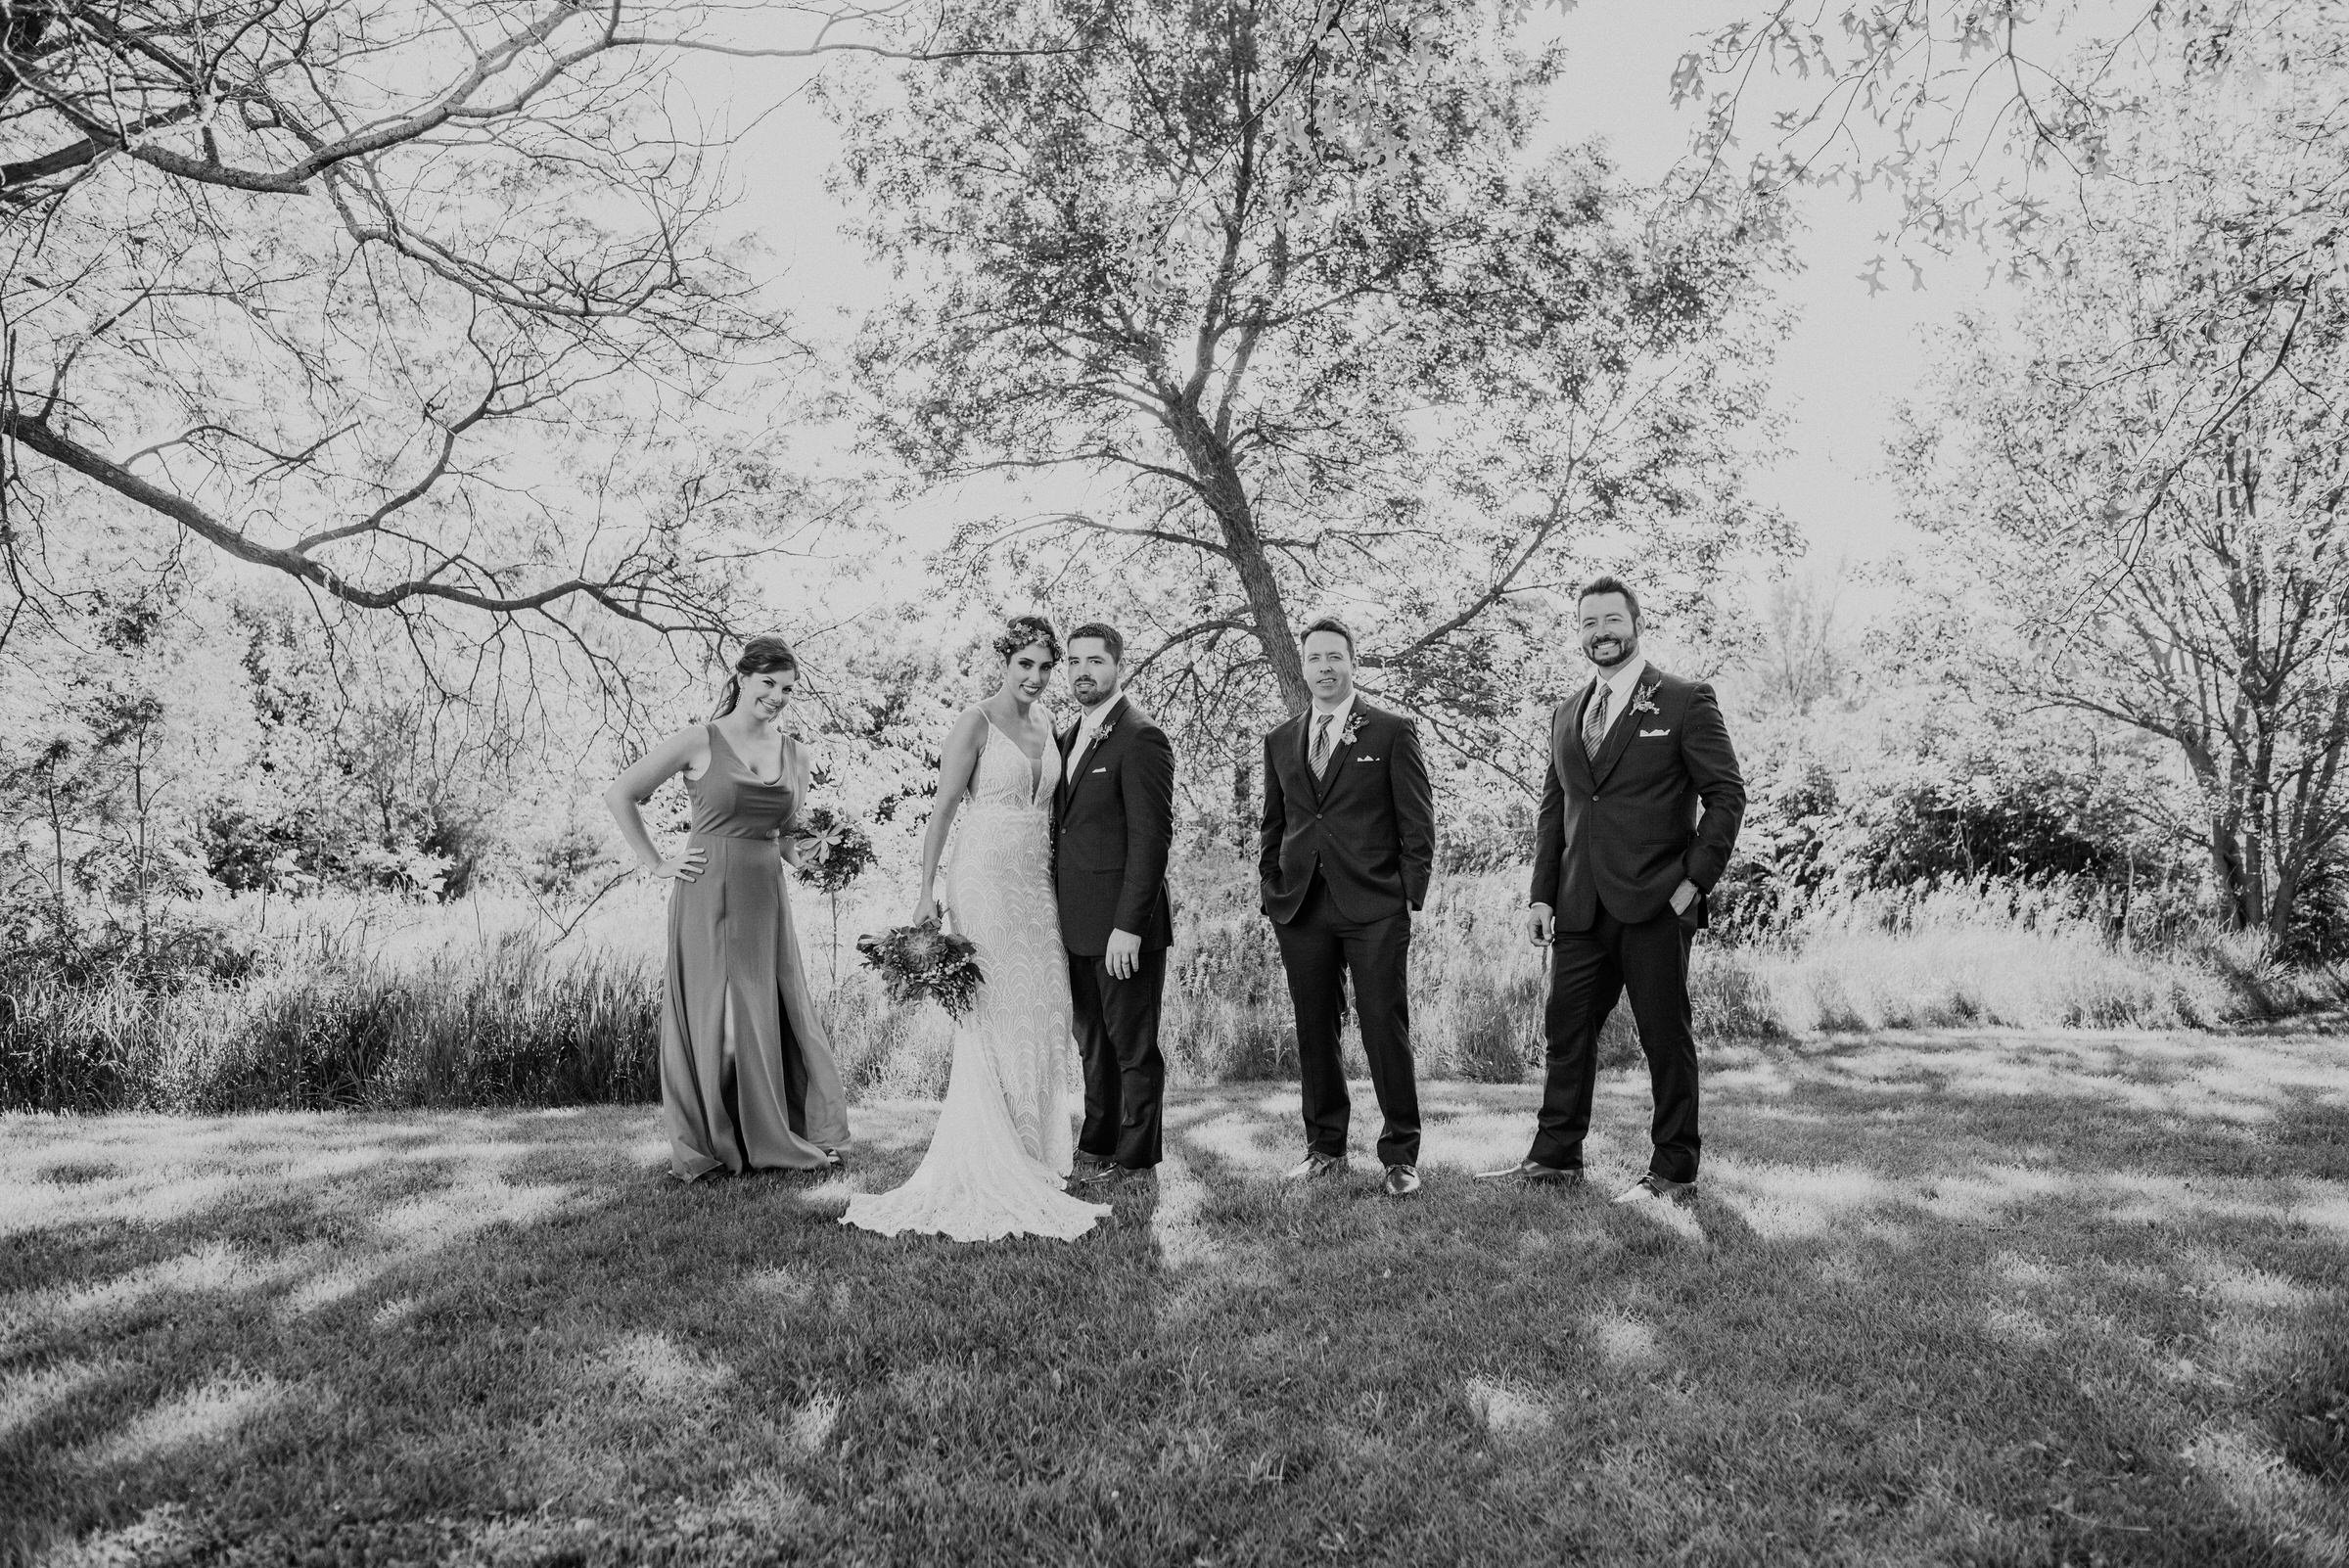 Wilderness-Ridge-Lincoln-Nebraska-Wedding-Kaylie-Sirek-Photography-070.jpg